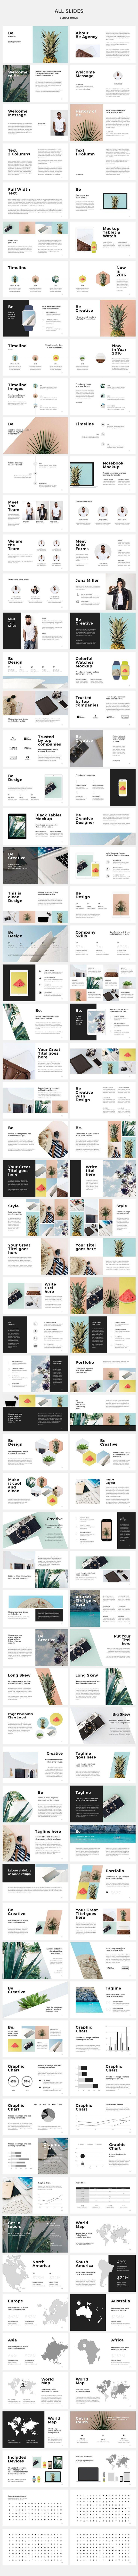 Be. Google Slides Template +30Photos #presentations #template